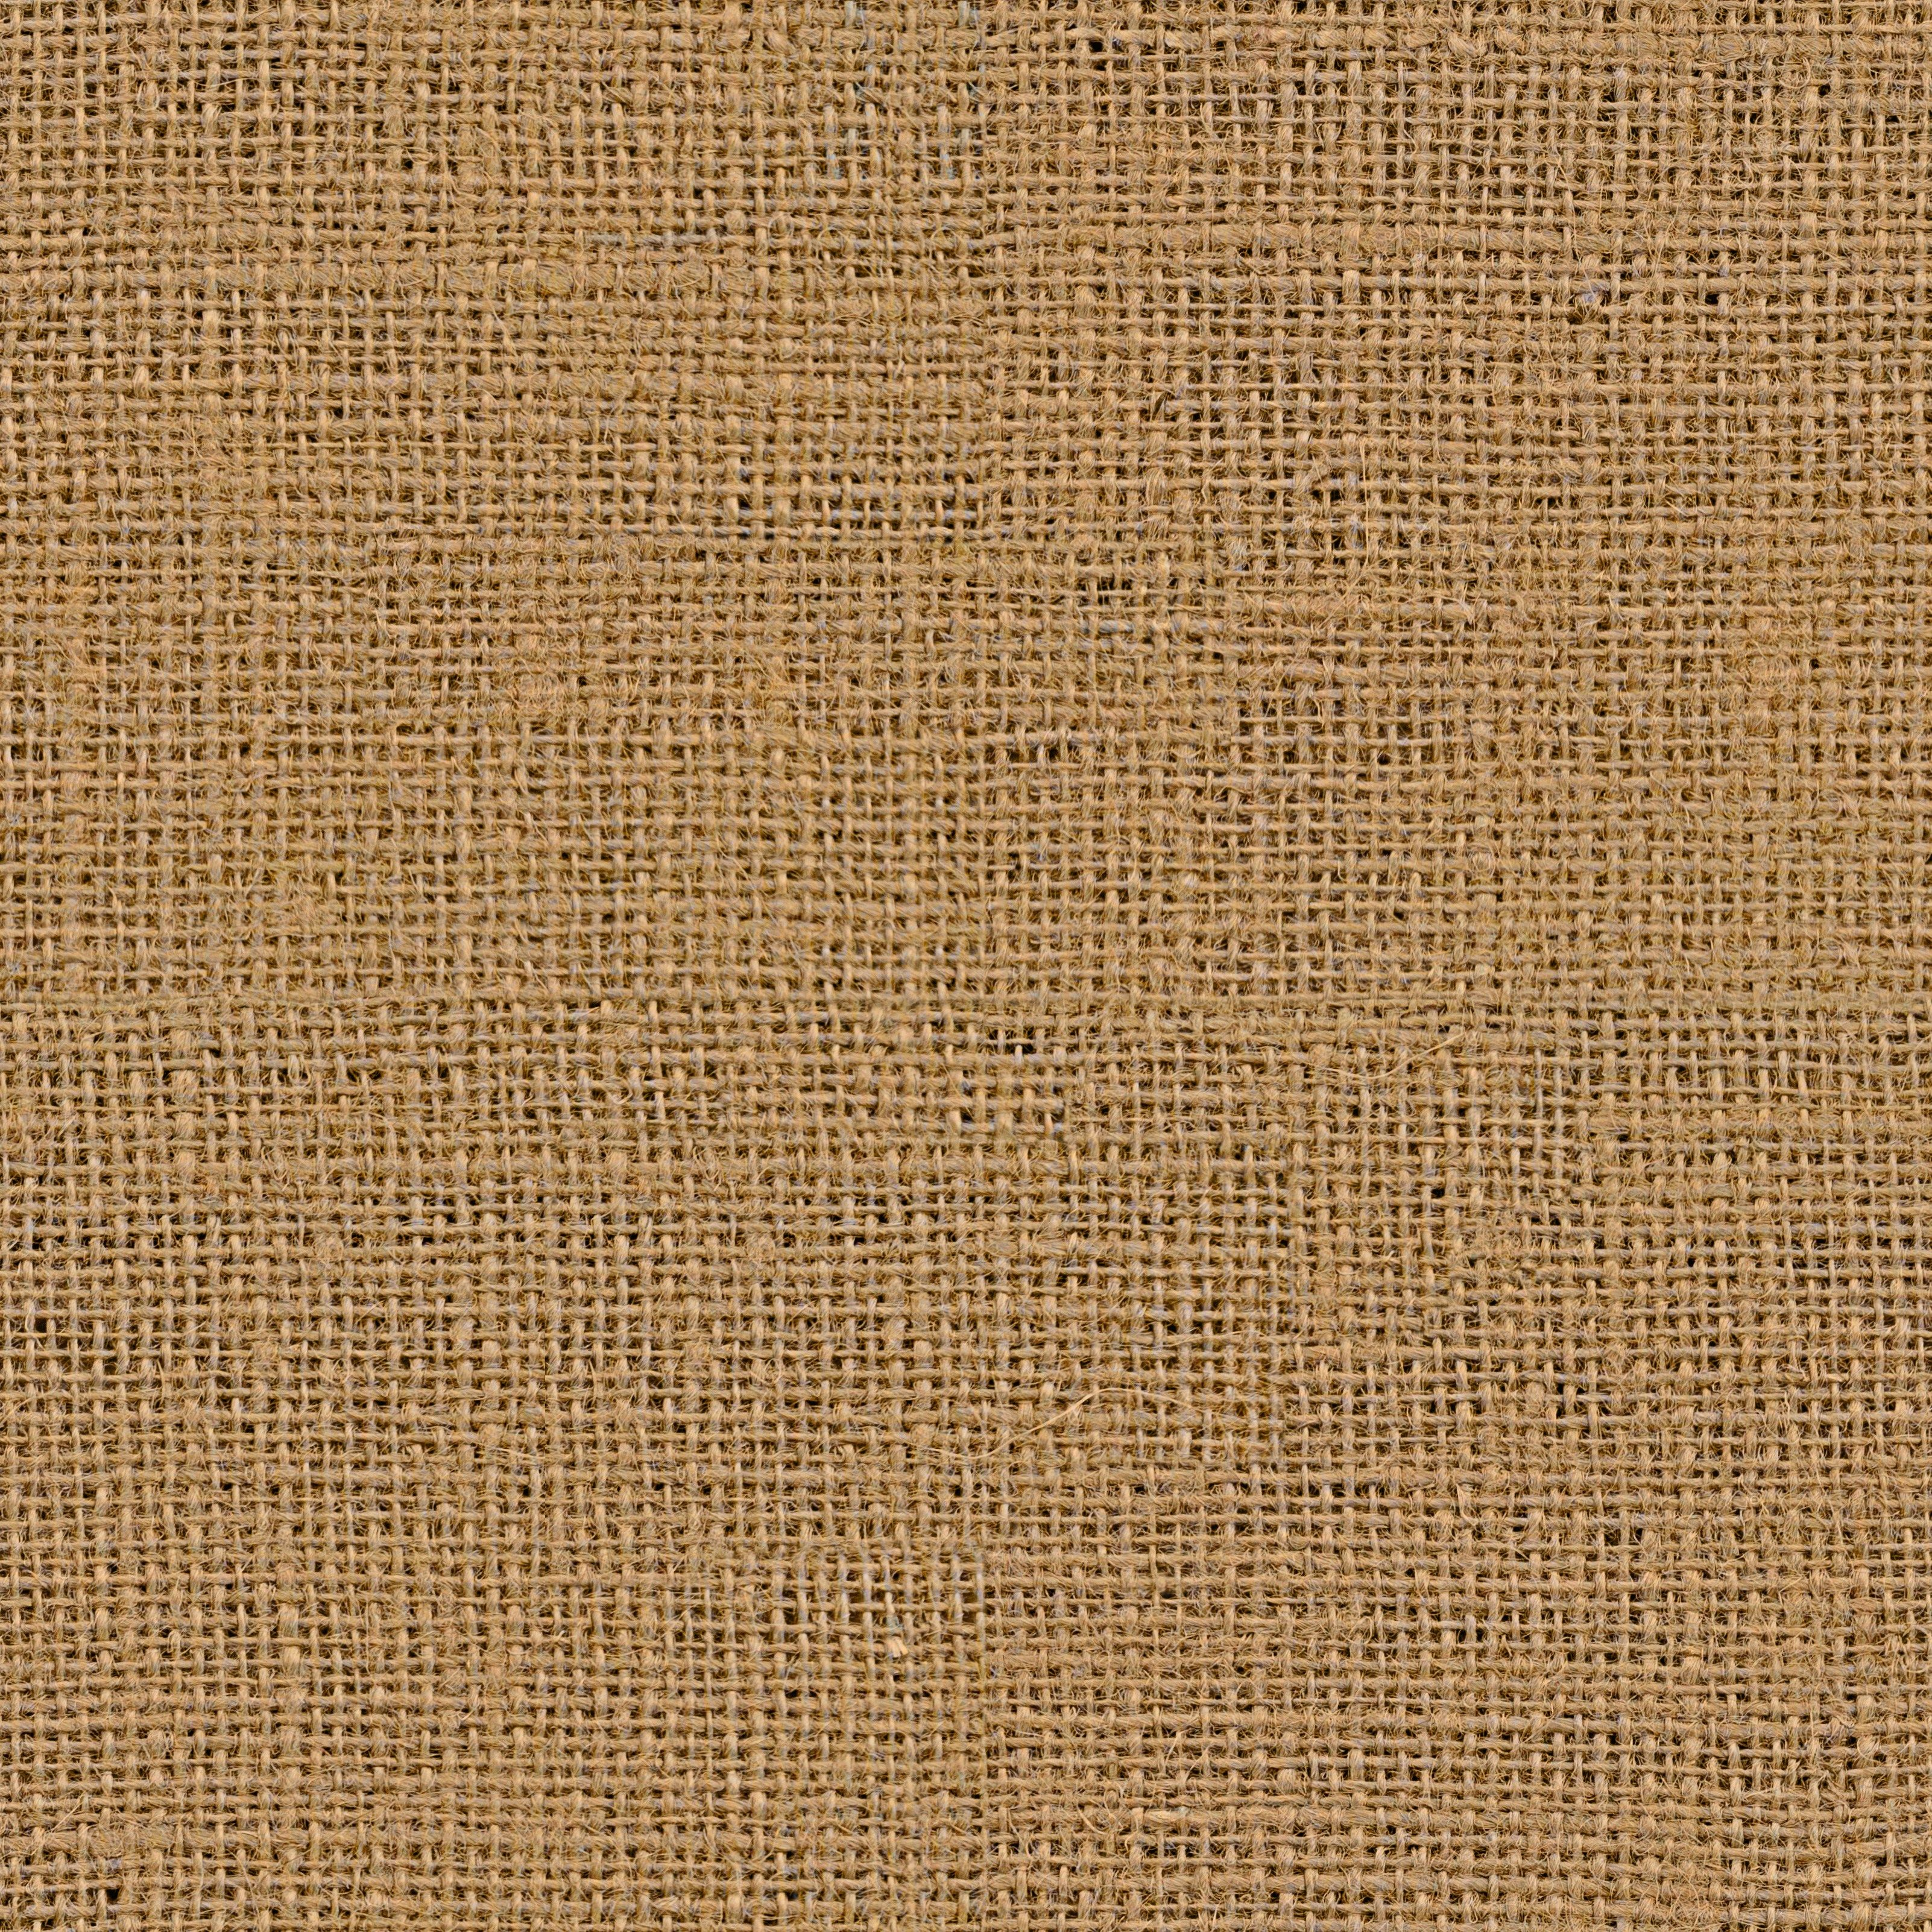 Burlap Fabric Texture Dokular